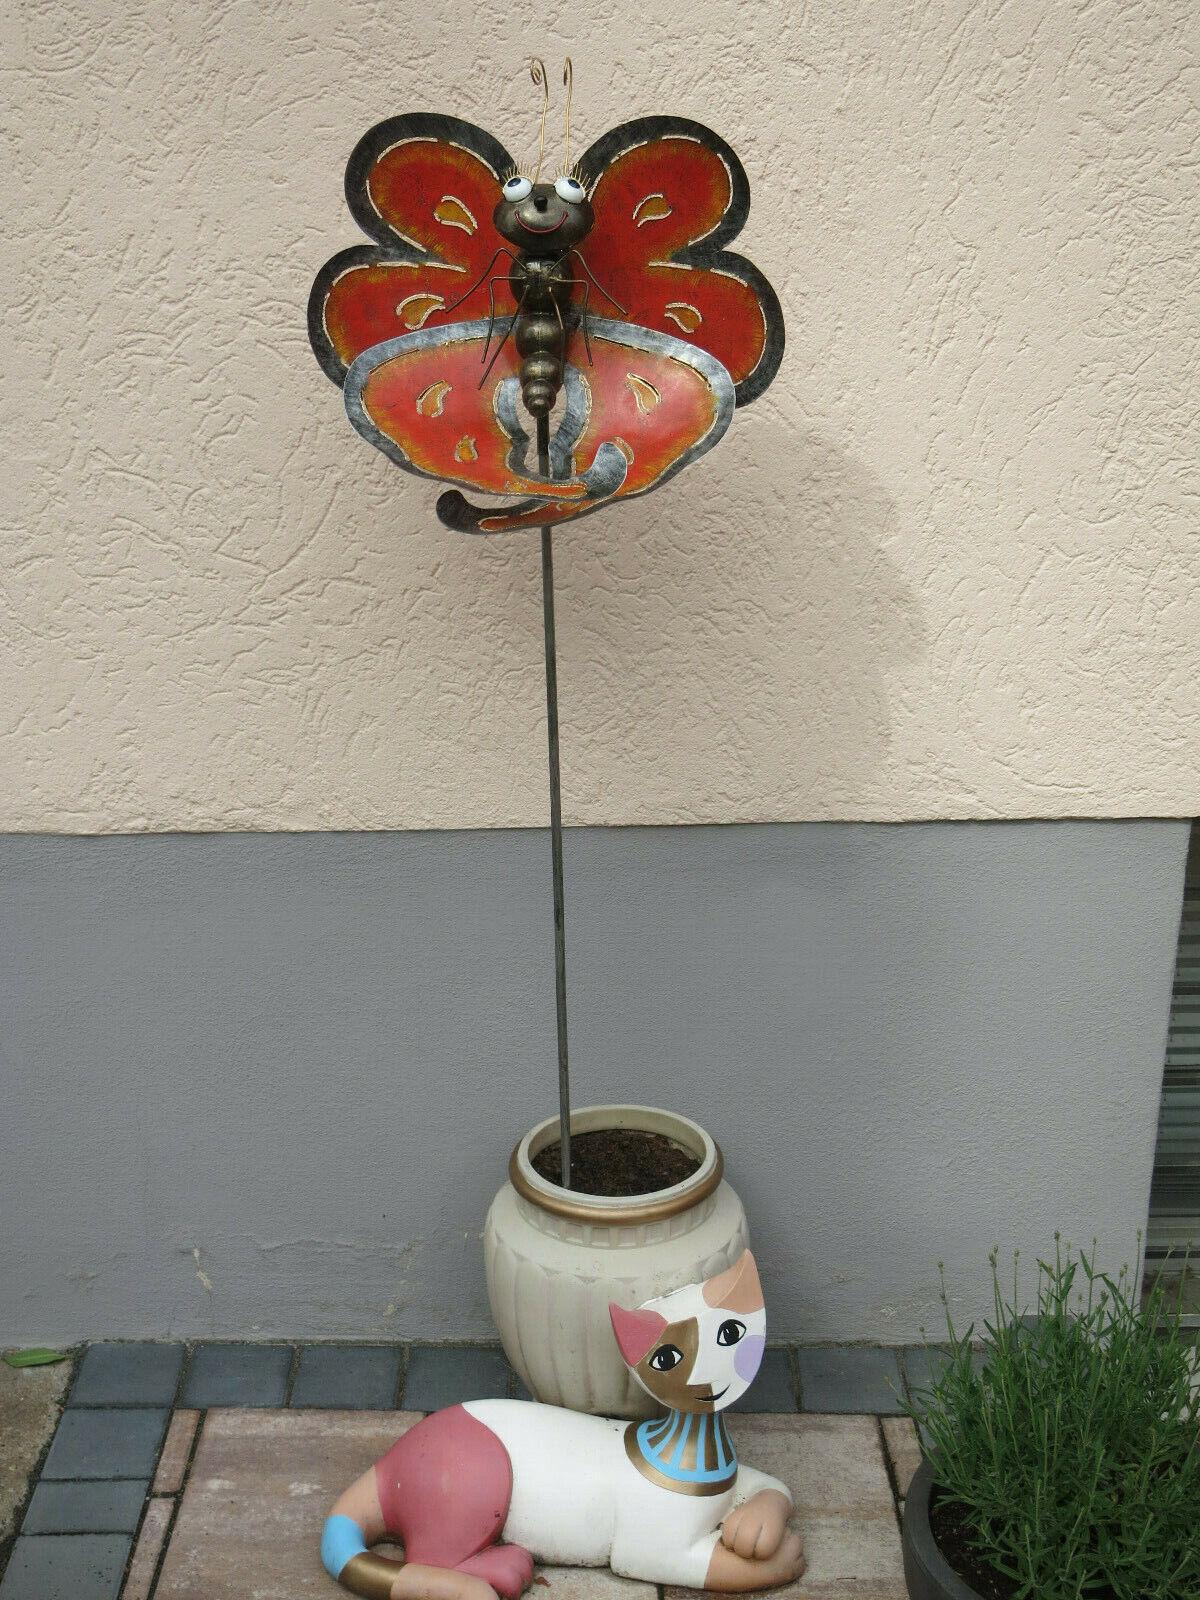 Enchufe para jardín, mariposa L, negro-naranja, altura 132 CM, metal personaje, 5141,